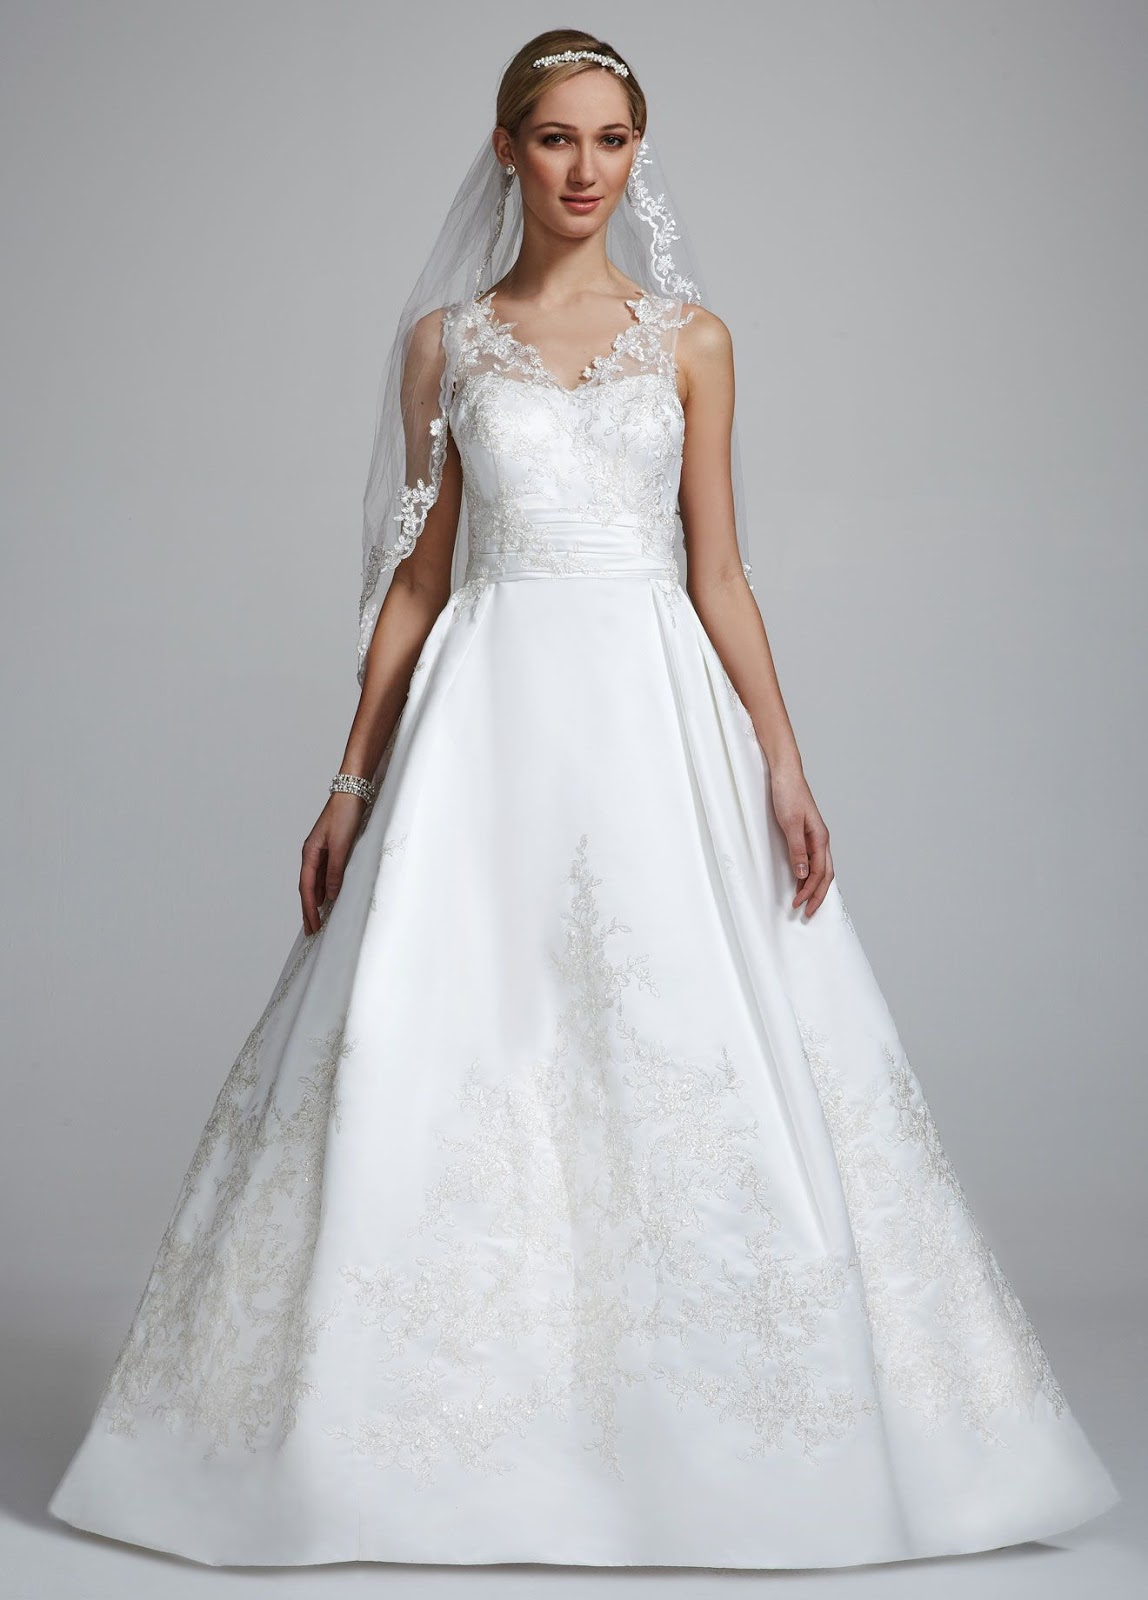 60f6444da2 Friday Five for Five- Wedding Dresses Under 500 Dollars Volume 10 ...